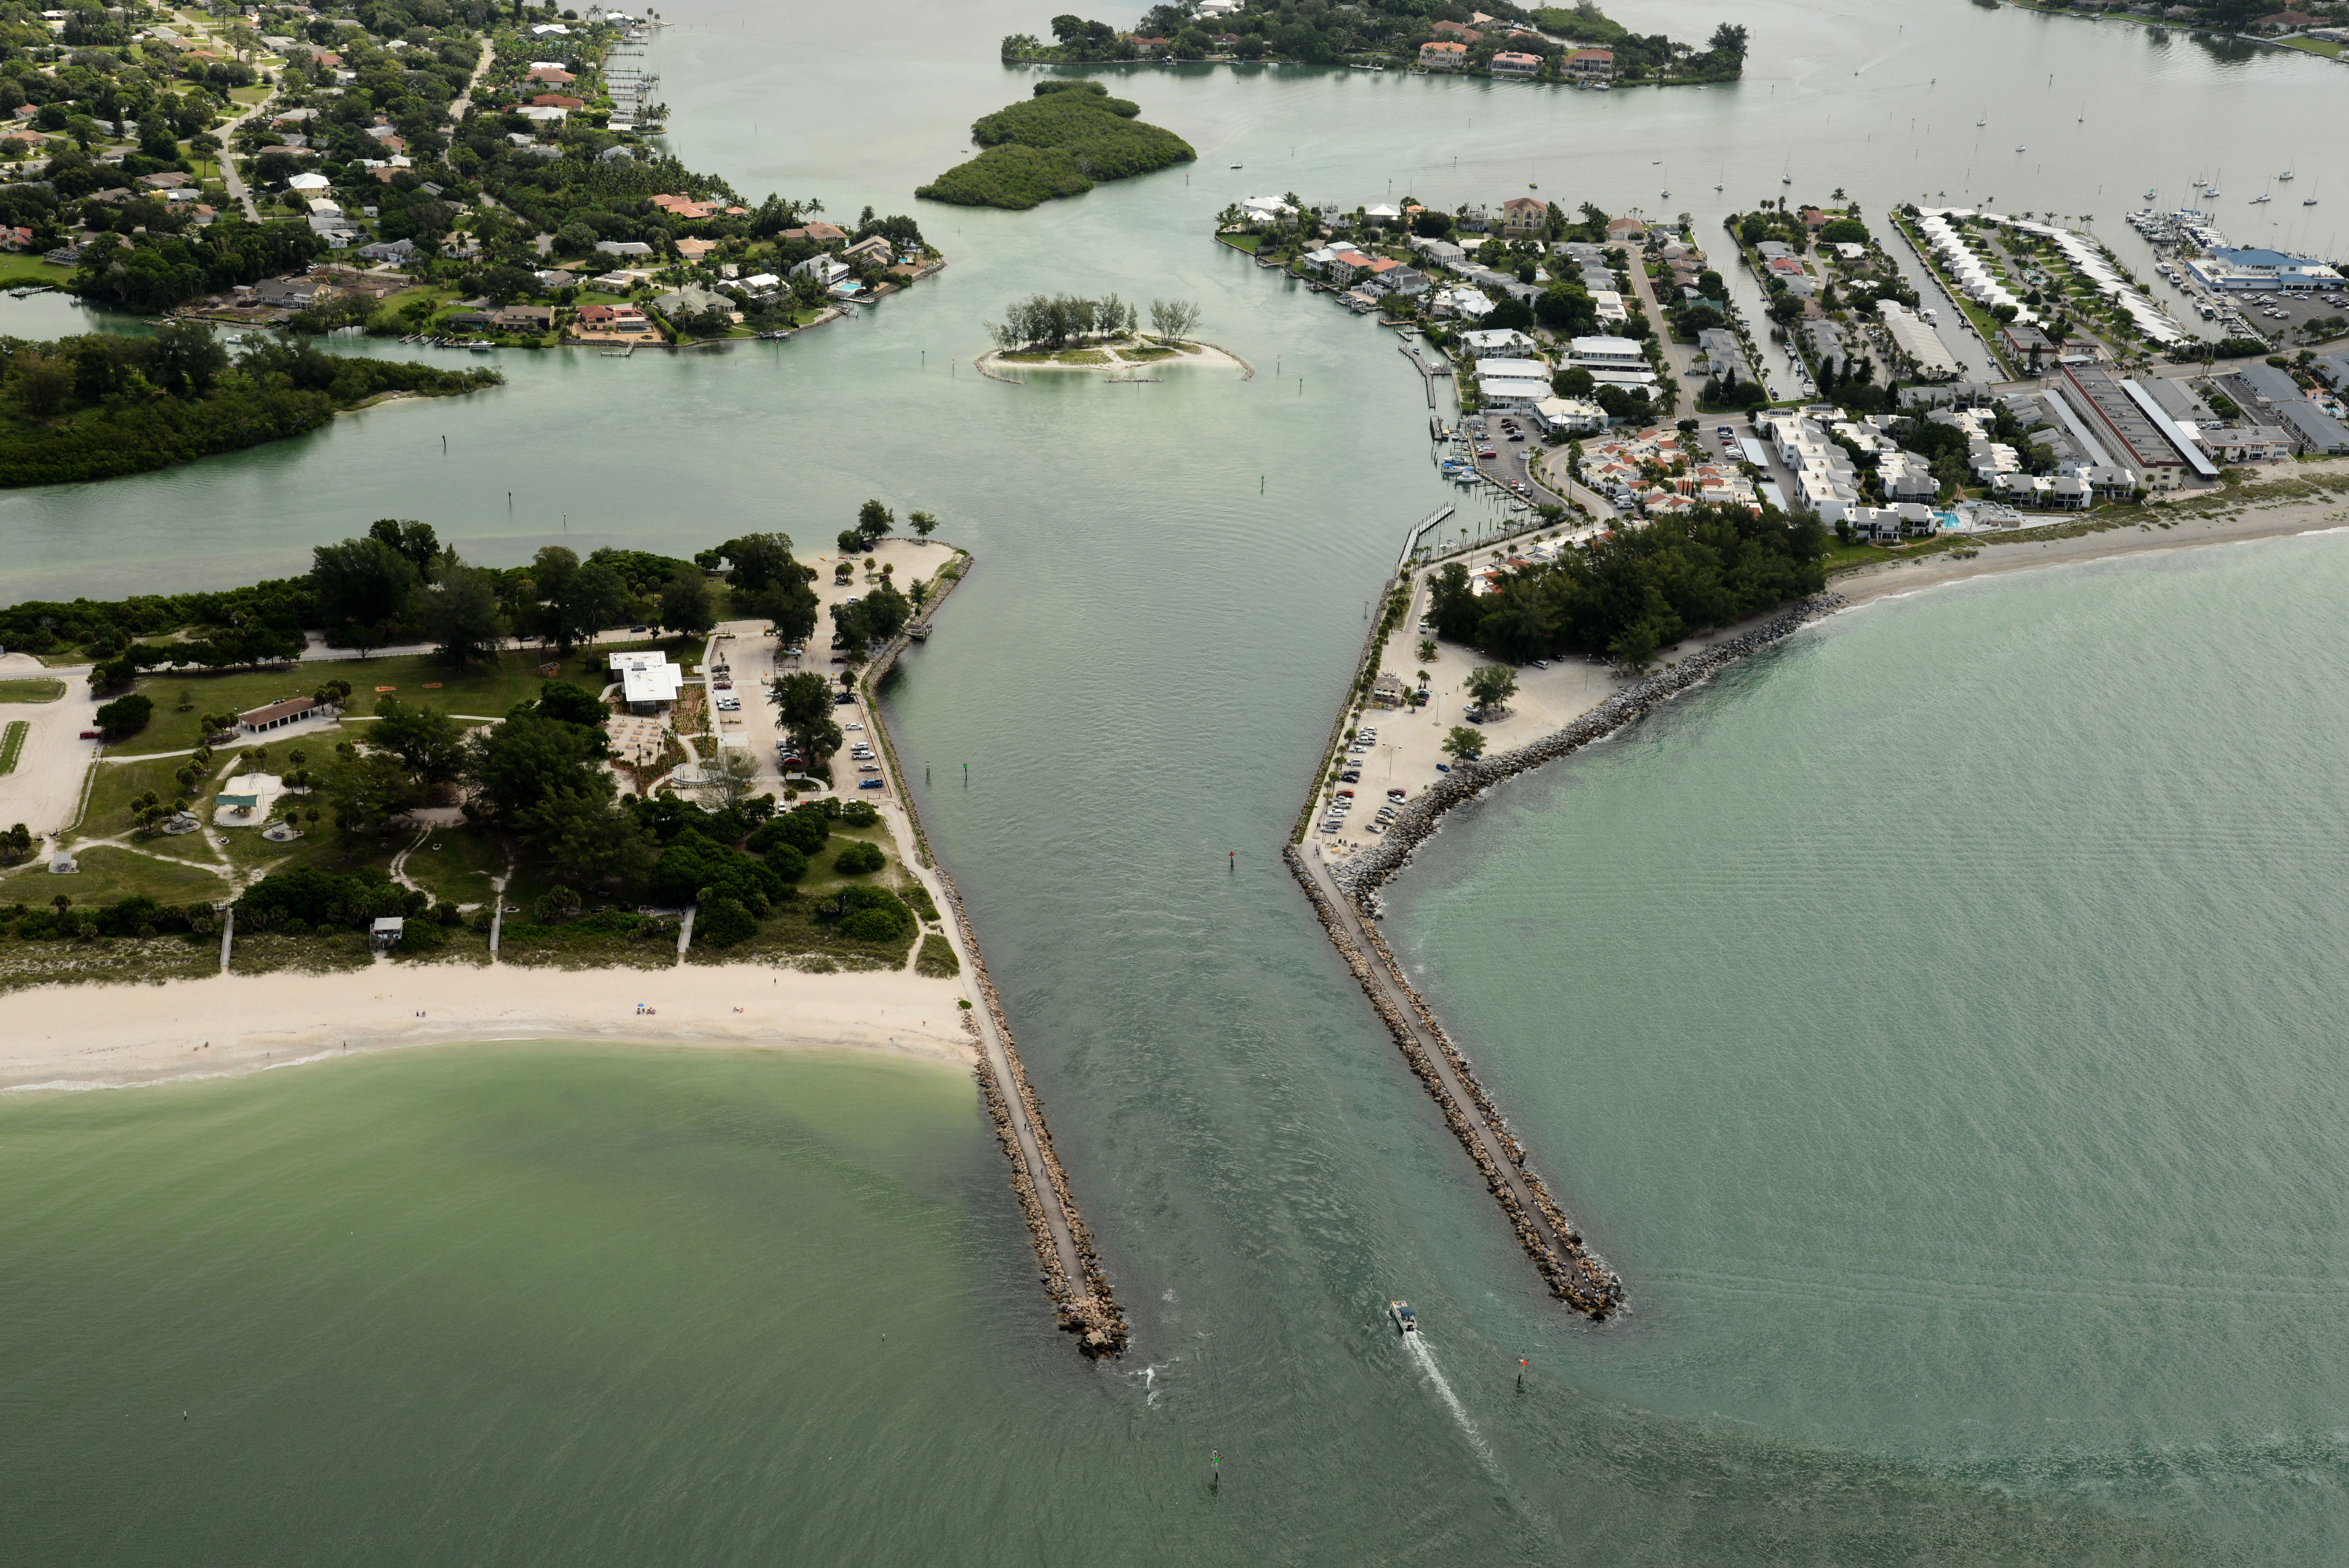 Snake Island 9-9-14 184.jpg